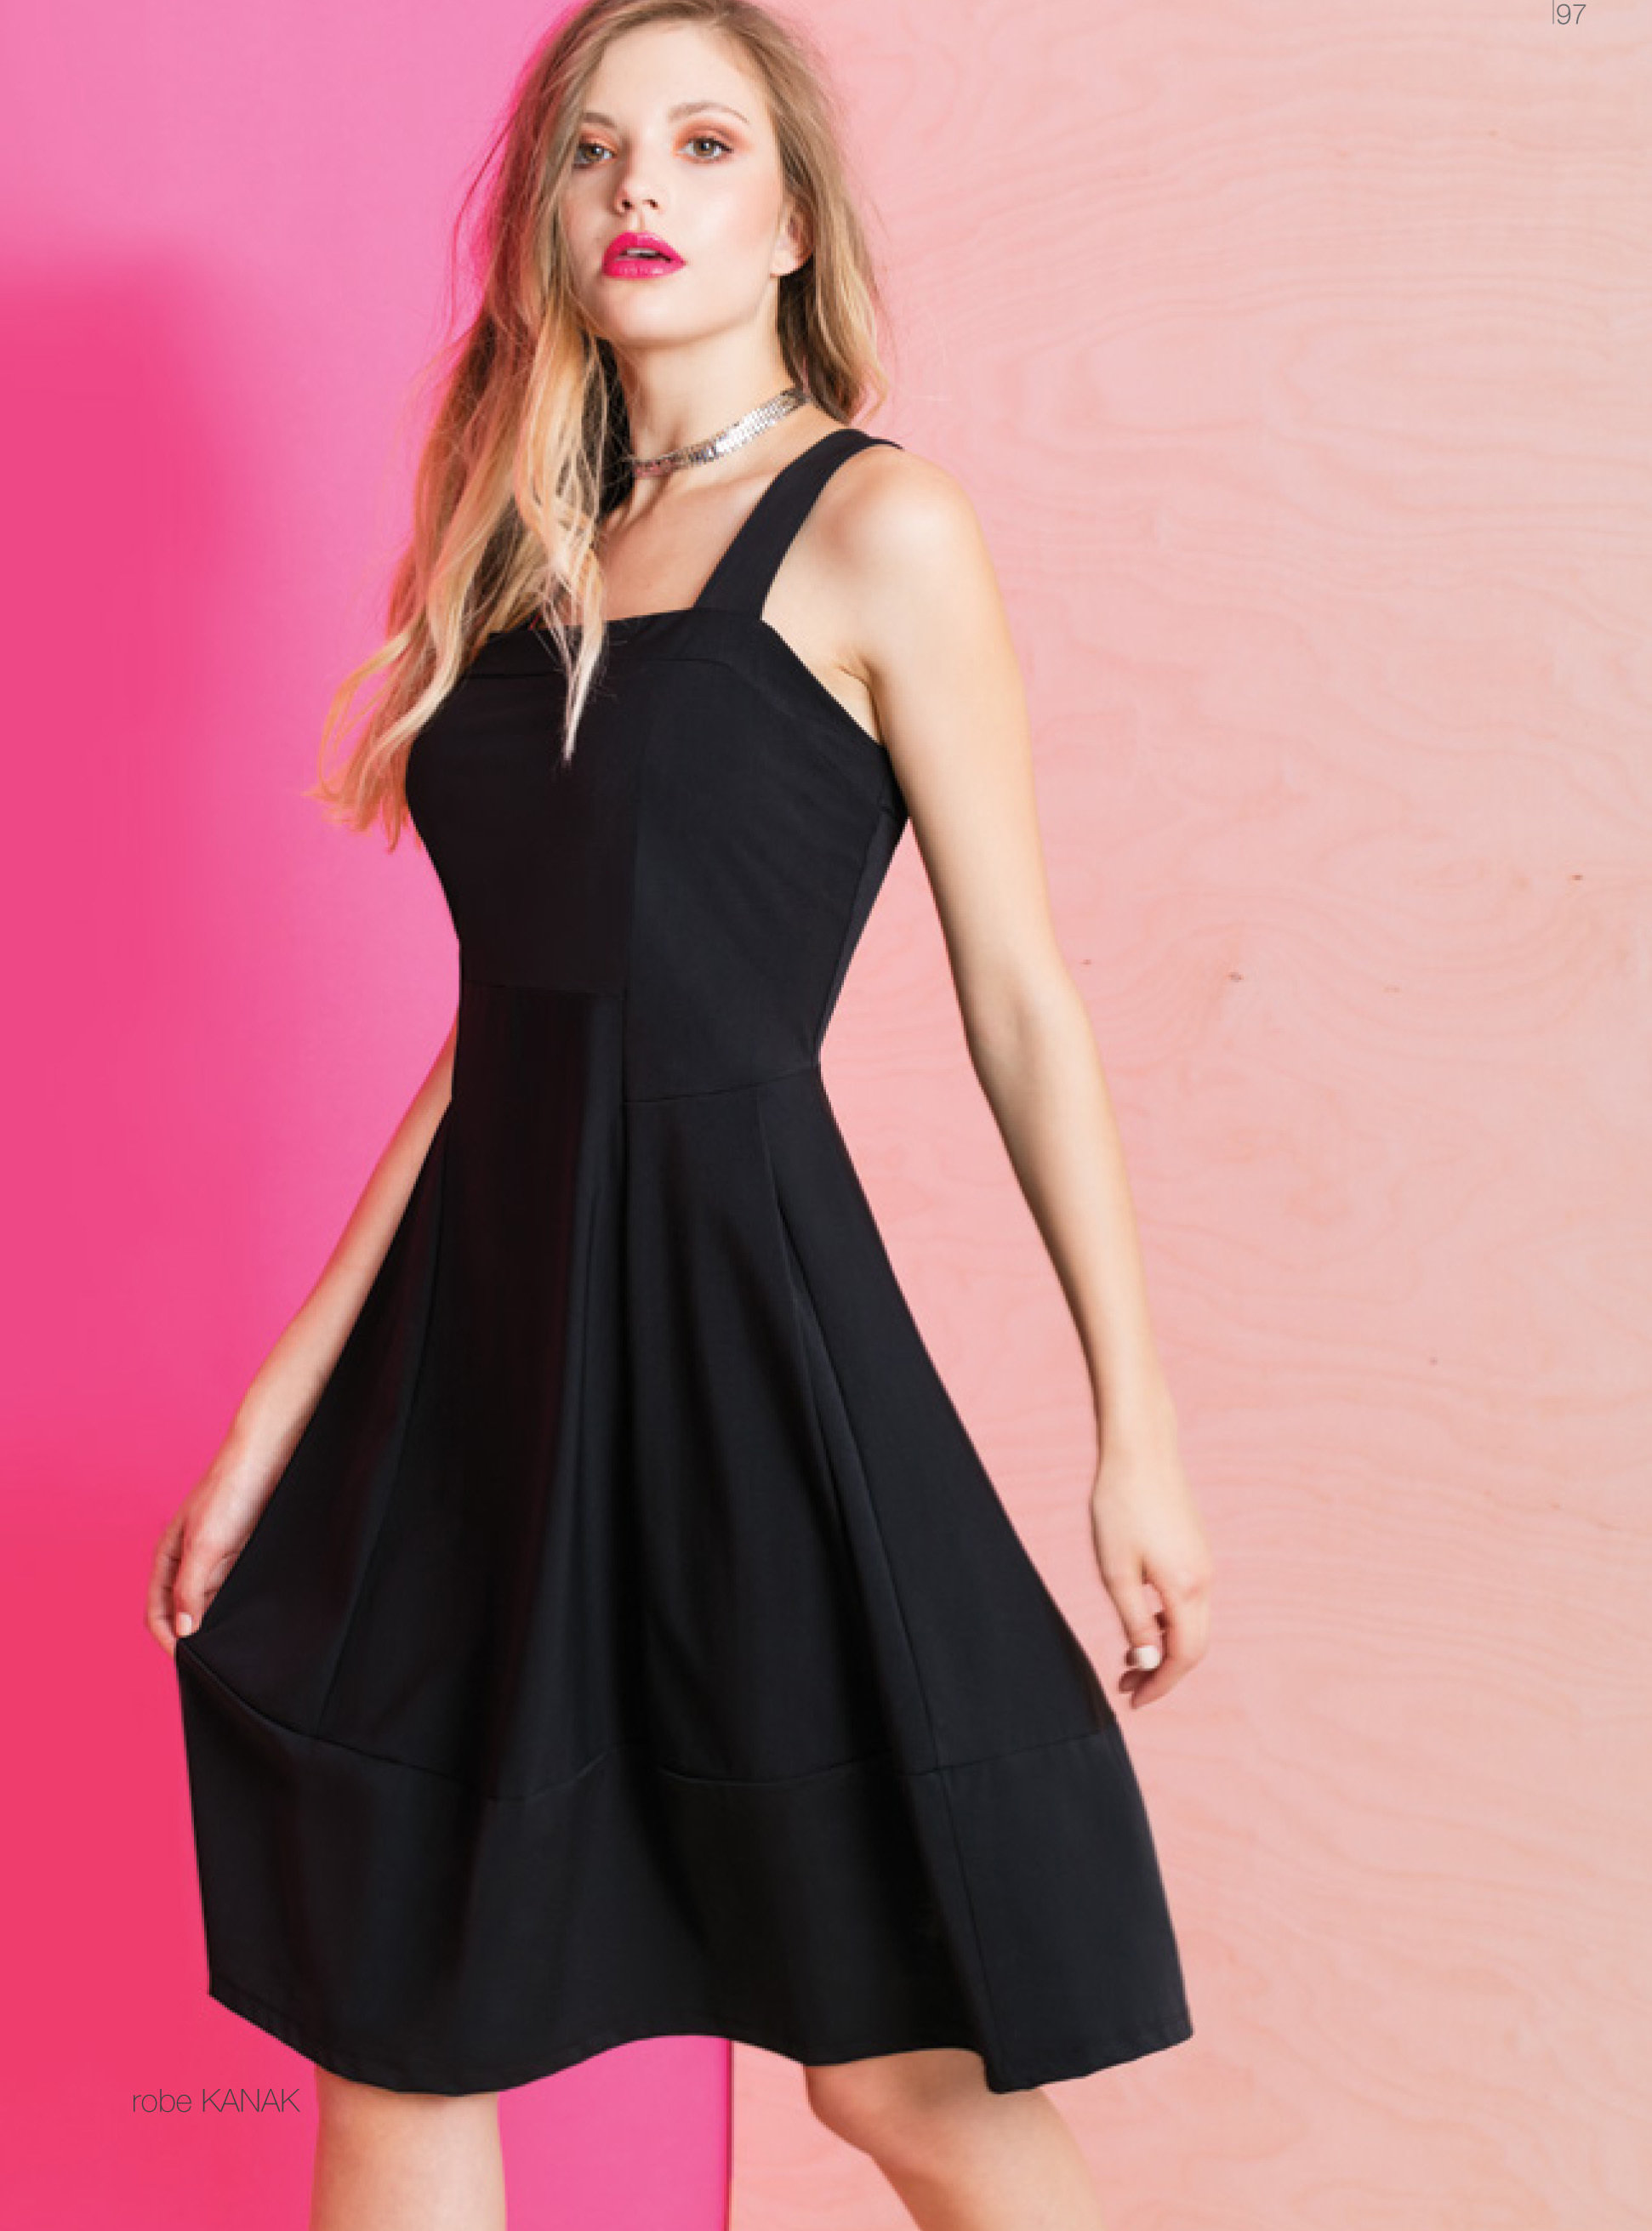 Maloka: Flirty Boxed Bodice Fit & Flare Dress (1 Left!) MK_KANAK_N